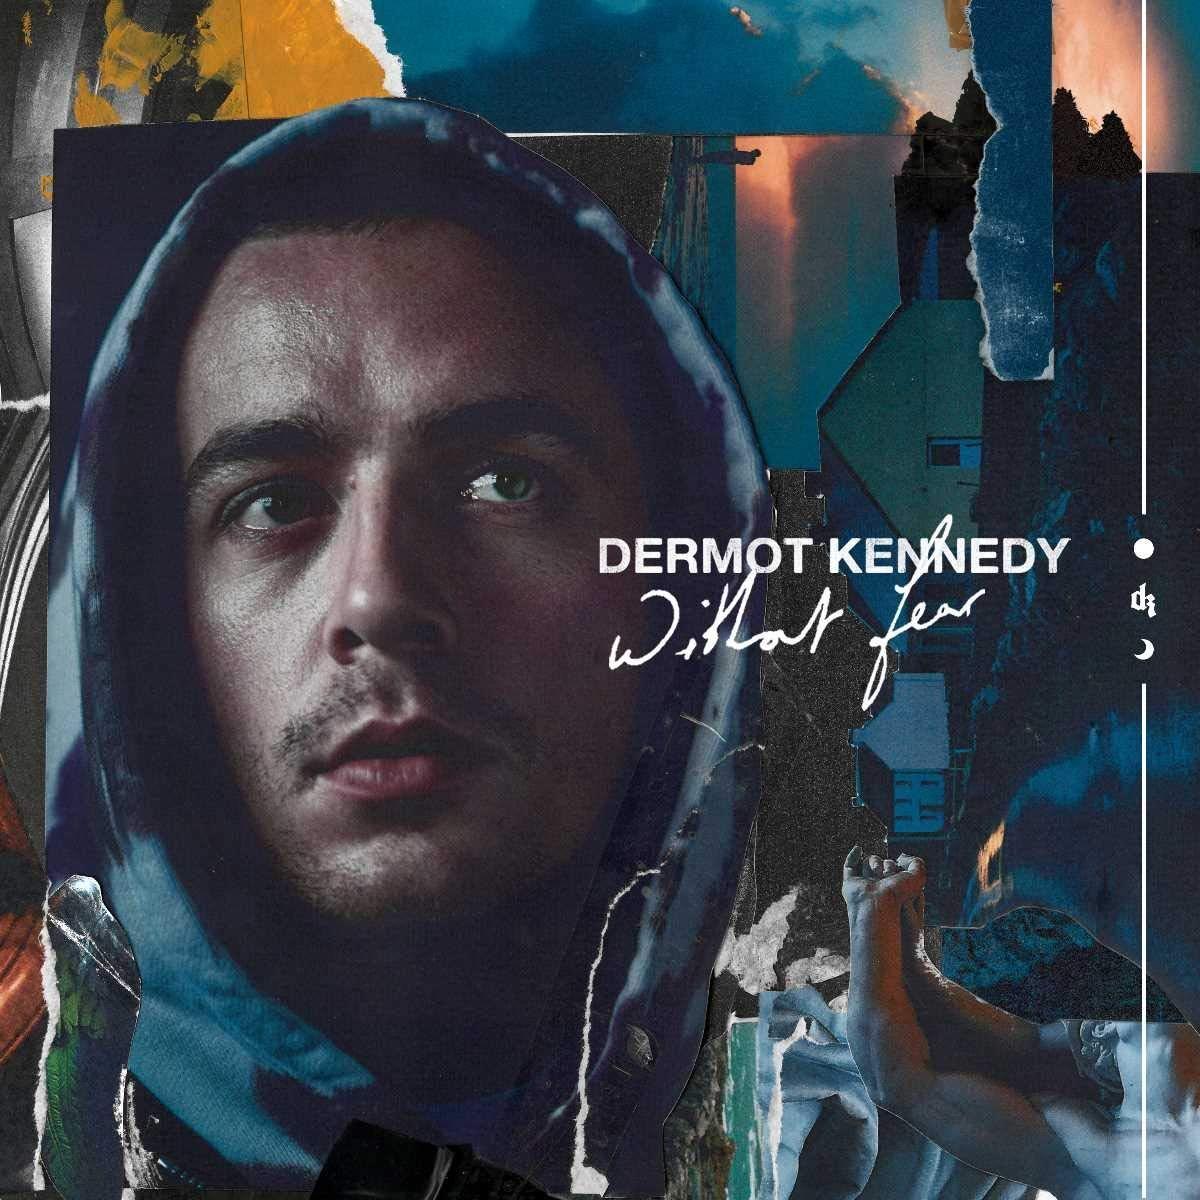 Dermot Kennedy - Without Fear / Black Vinyl 180g [amazonPrime] & [mediamarkt]